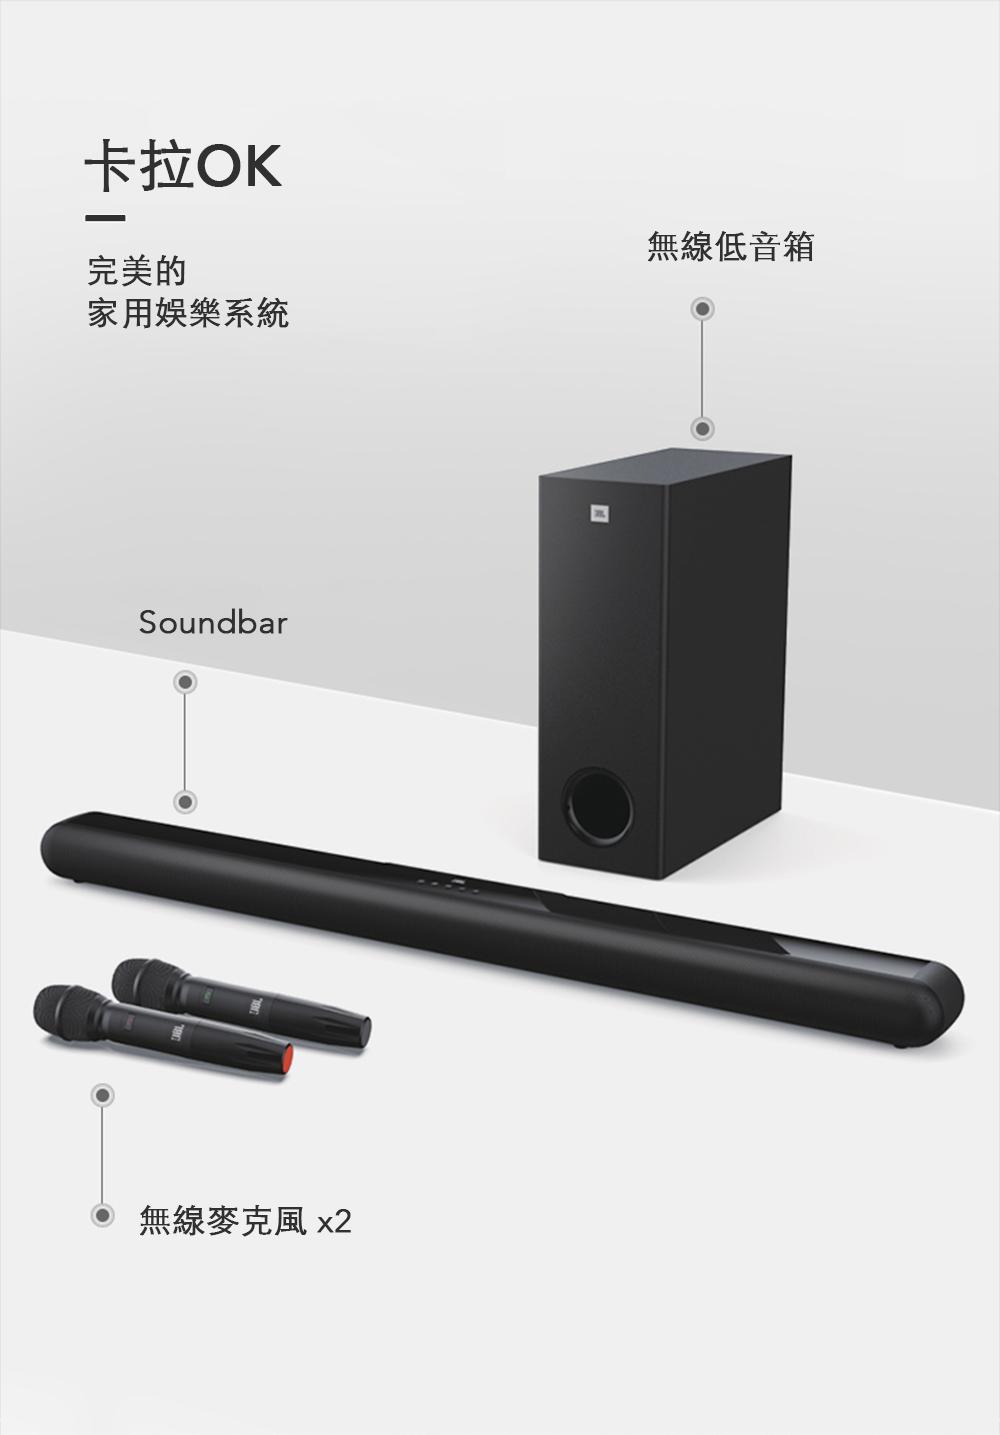 JBL-CINEMA-KTV350-Catalogue-(繁體中文)3.png